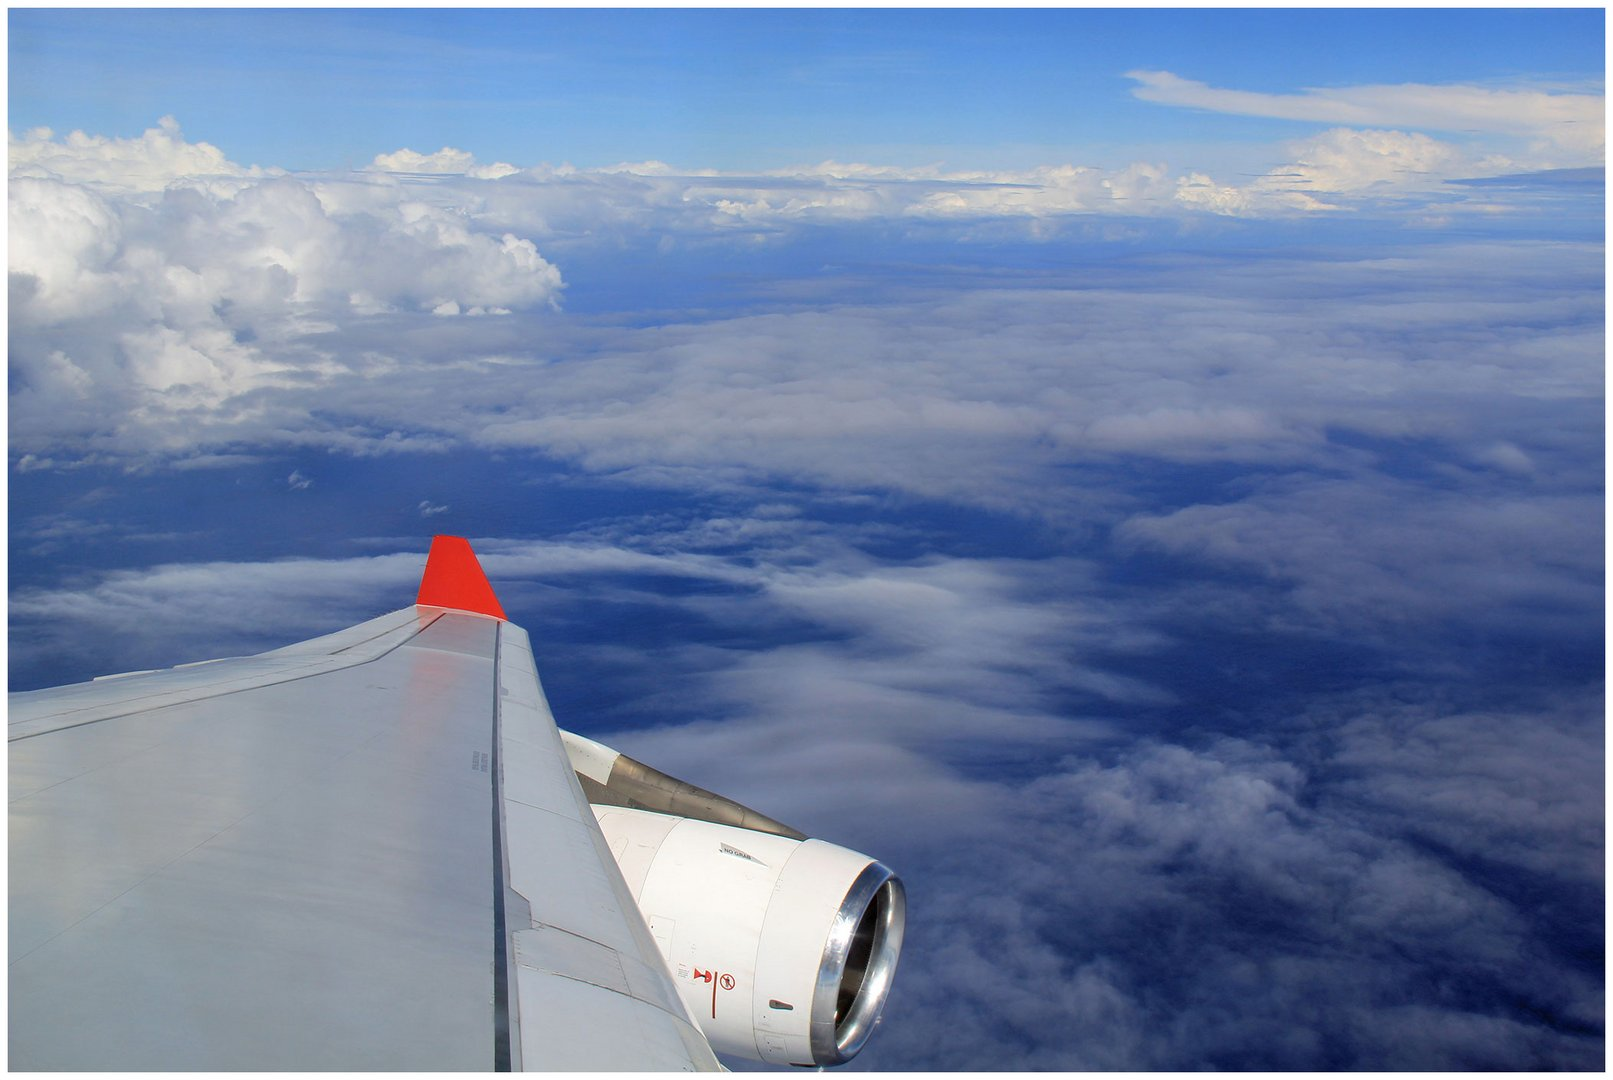 Fly away......